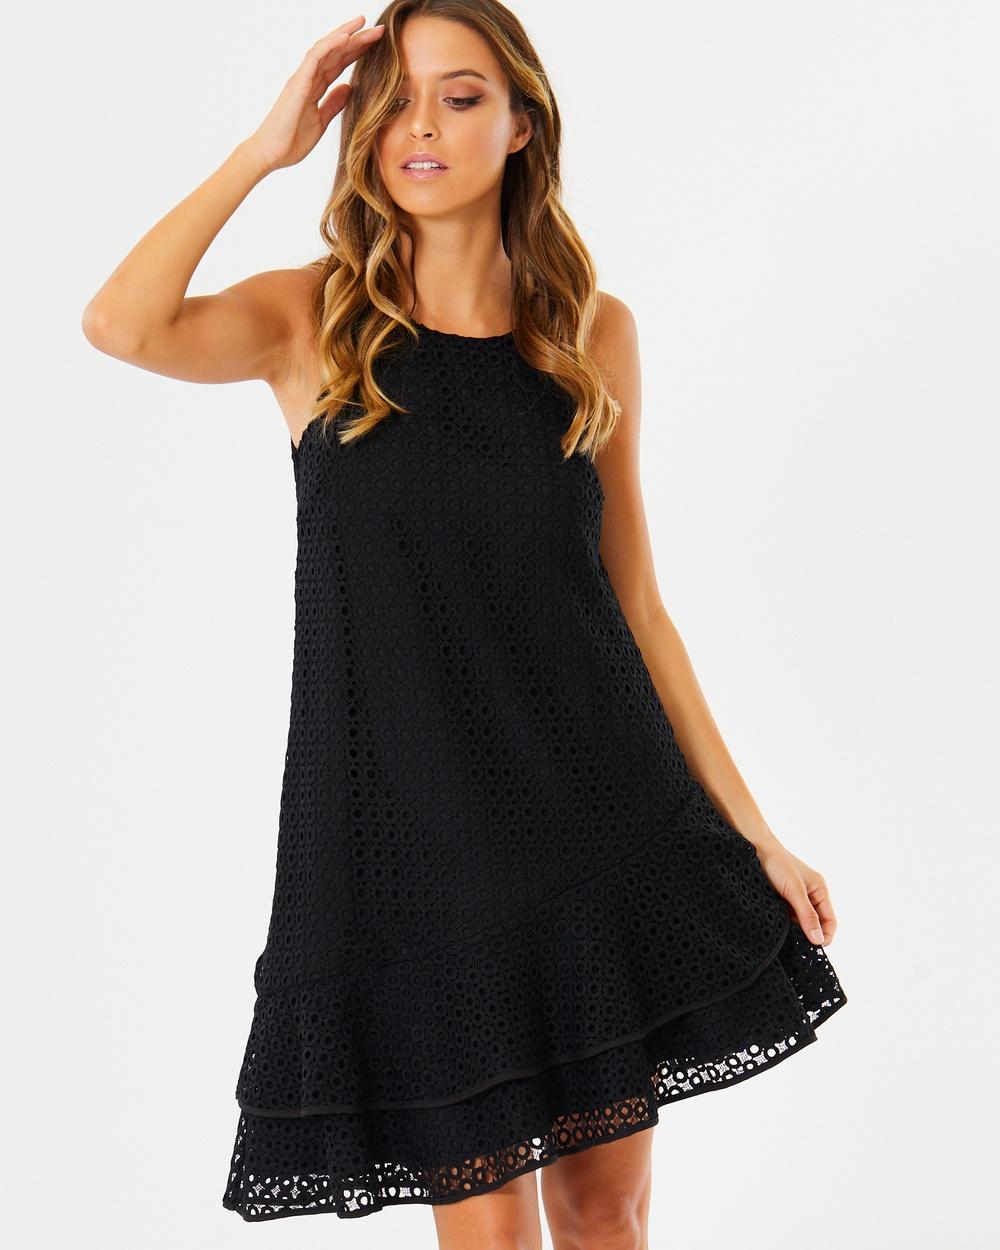 Calli Melina Frill Hem Dress Dresses Black Lace Melina Frill-Hem Dress